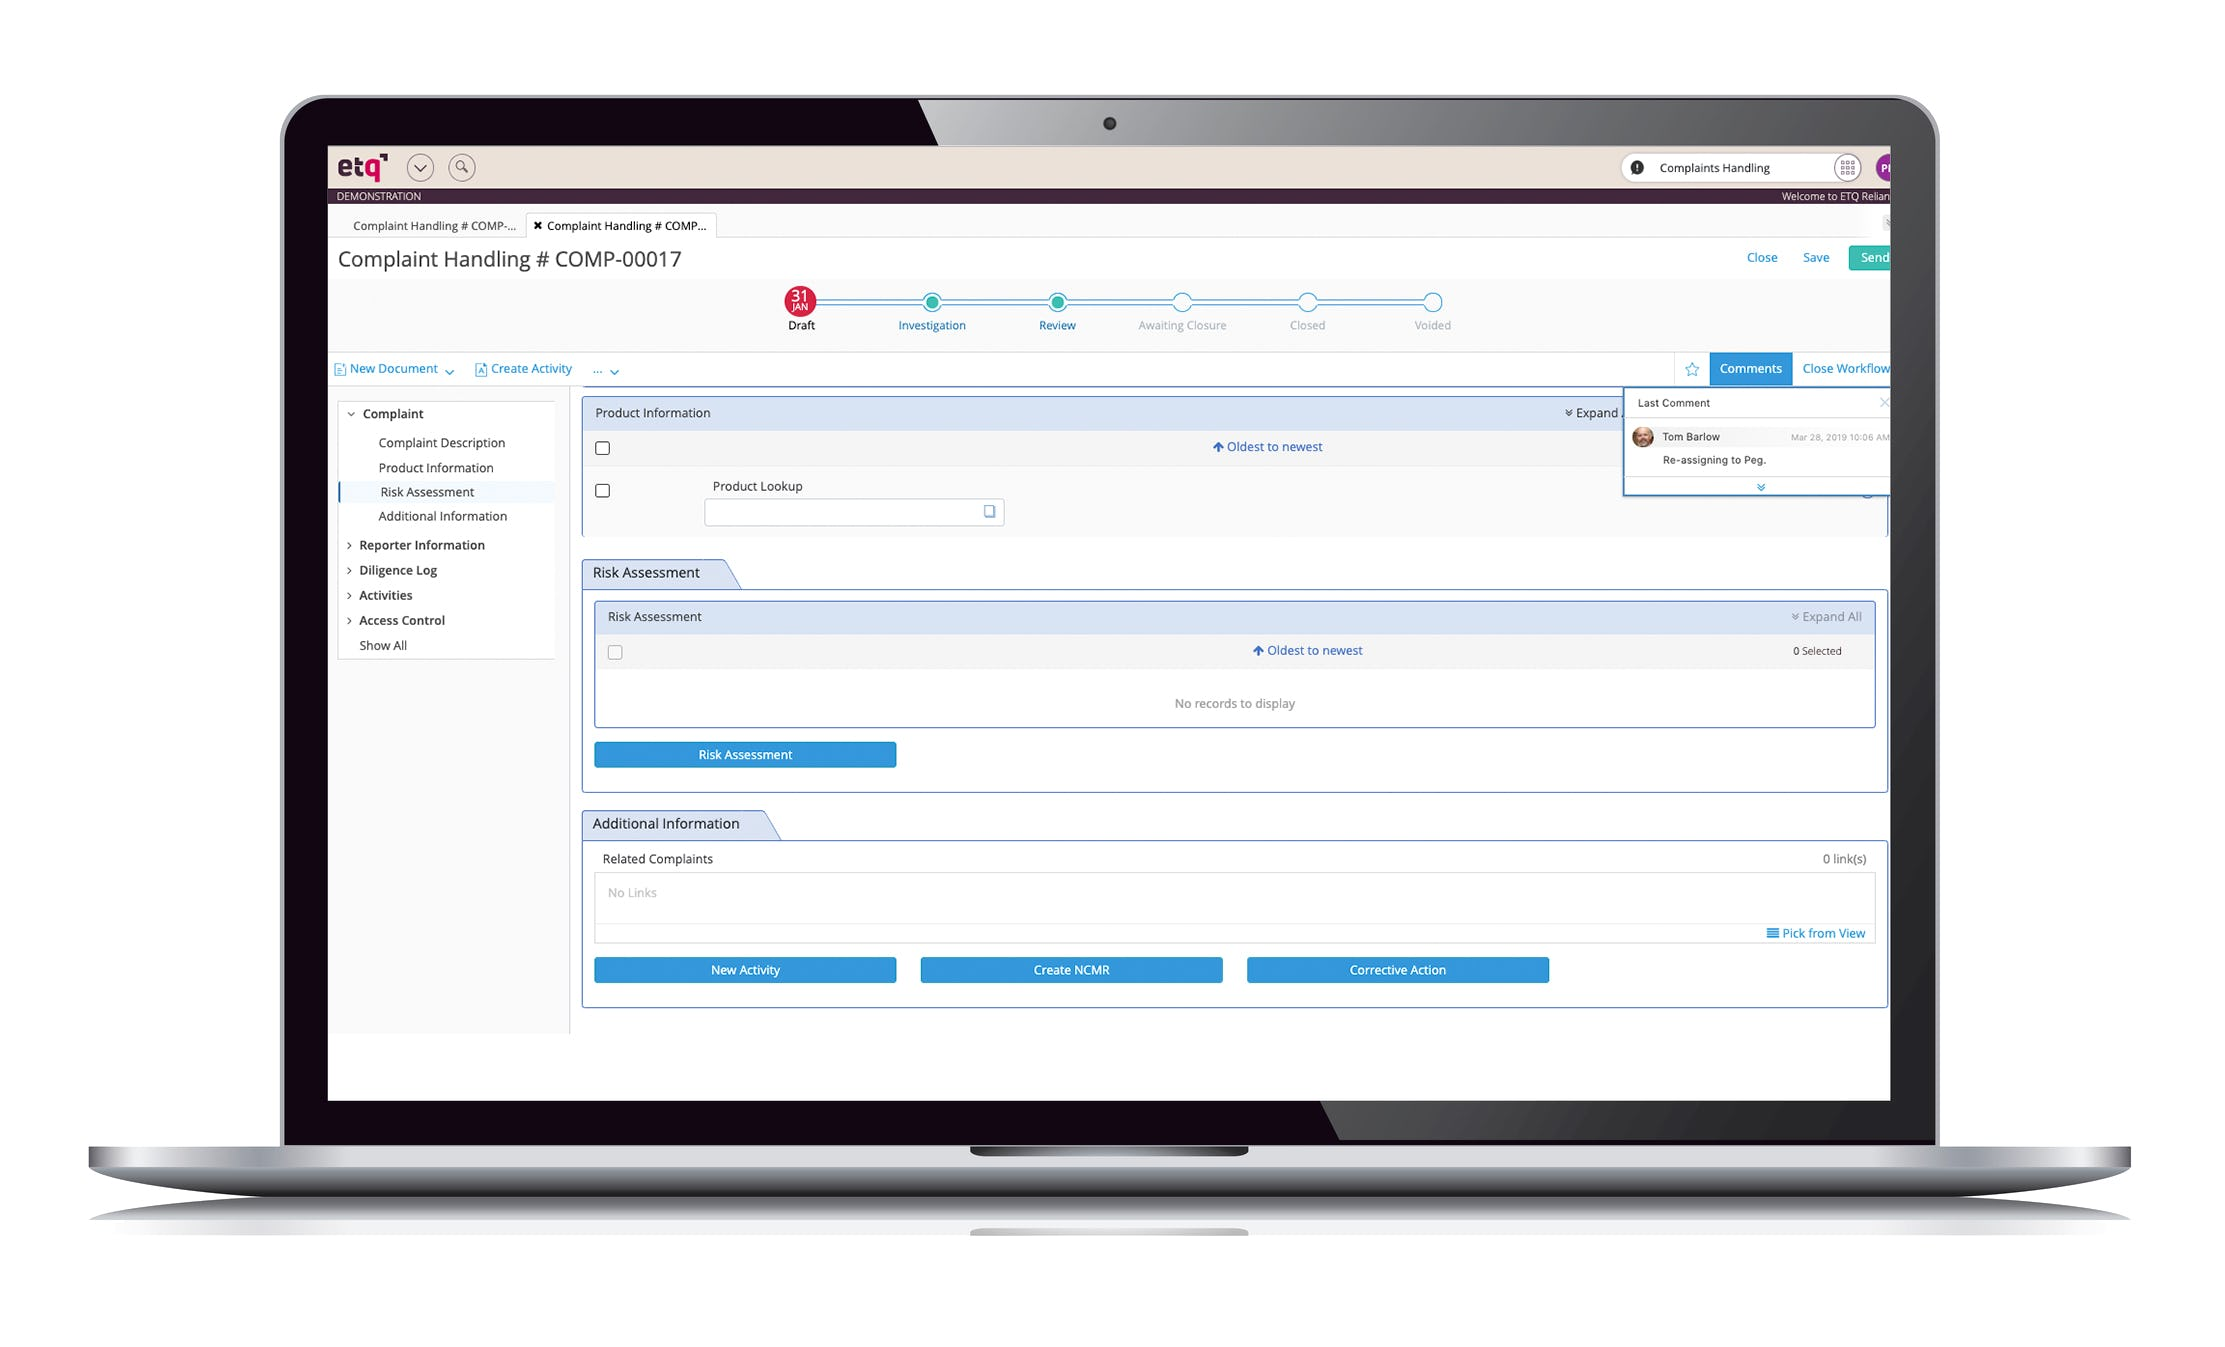 ETQ Reliance Software - Complaints Handling